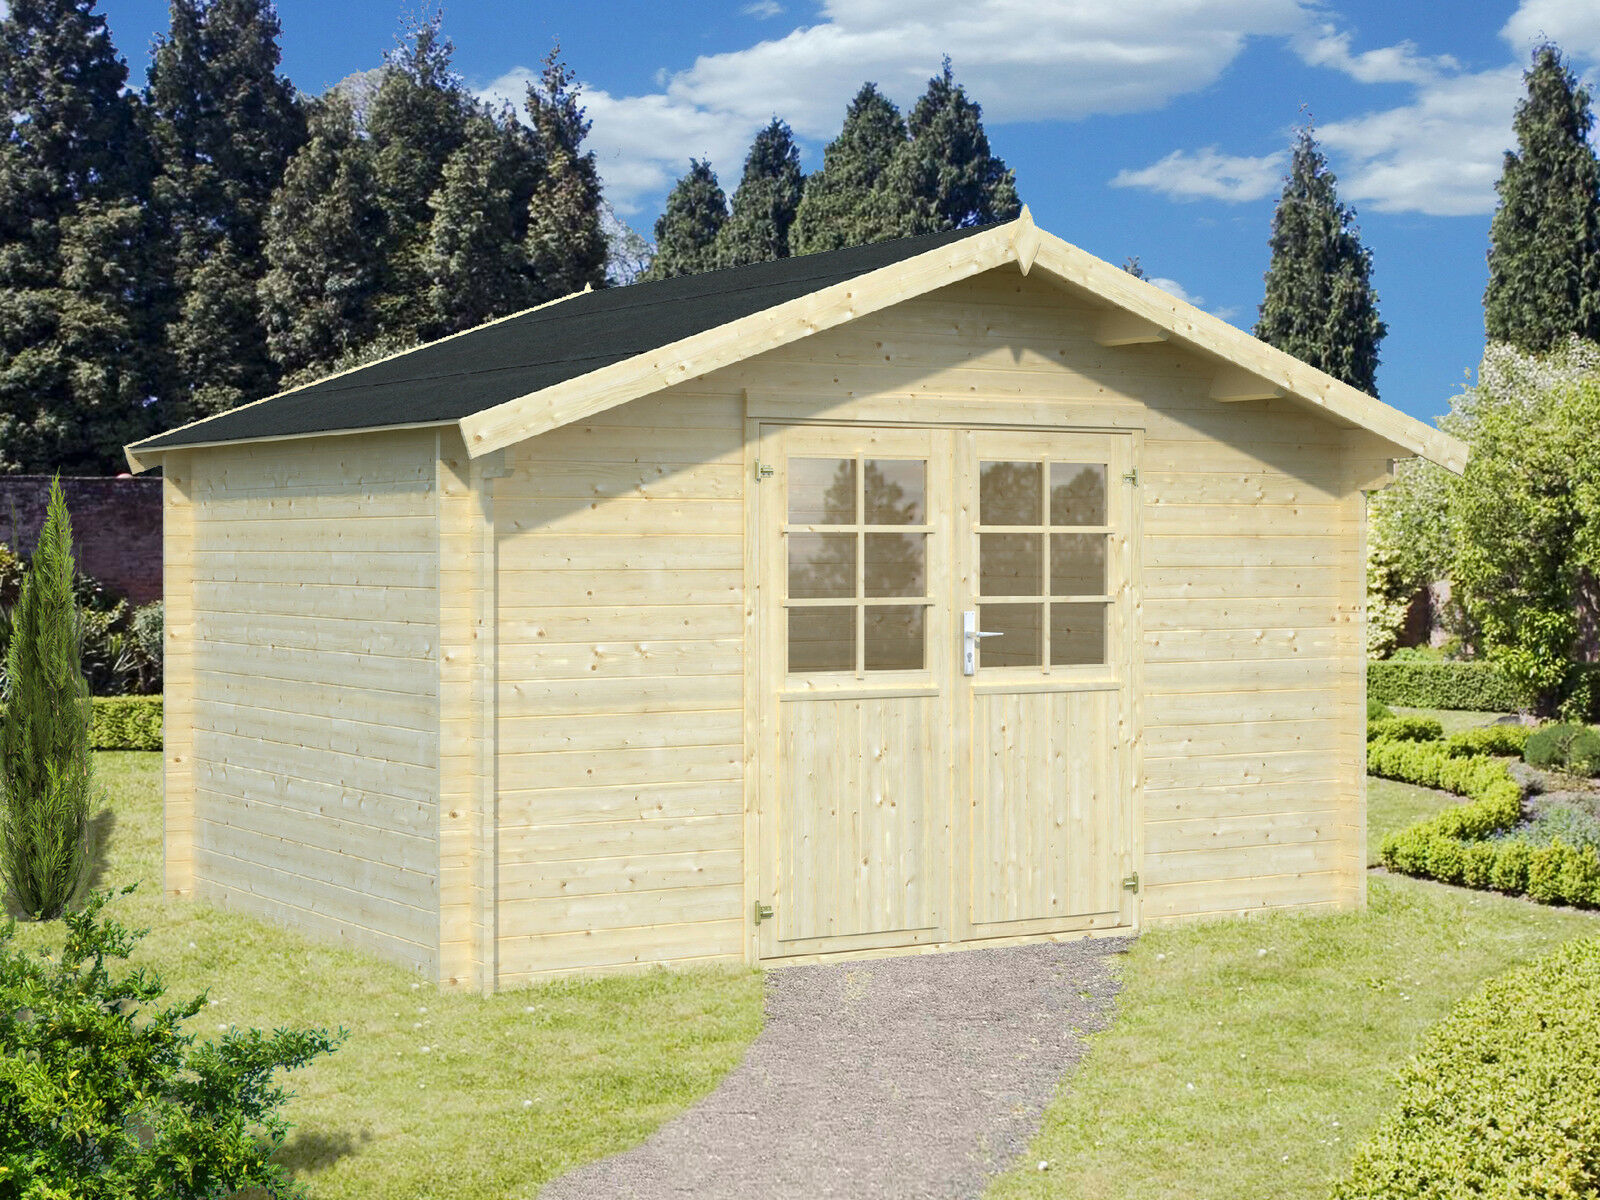 34 mm gartenhaus greta ca. 4x3 m gerätehaus blockhaus holz haus